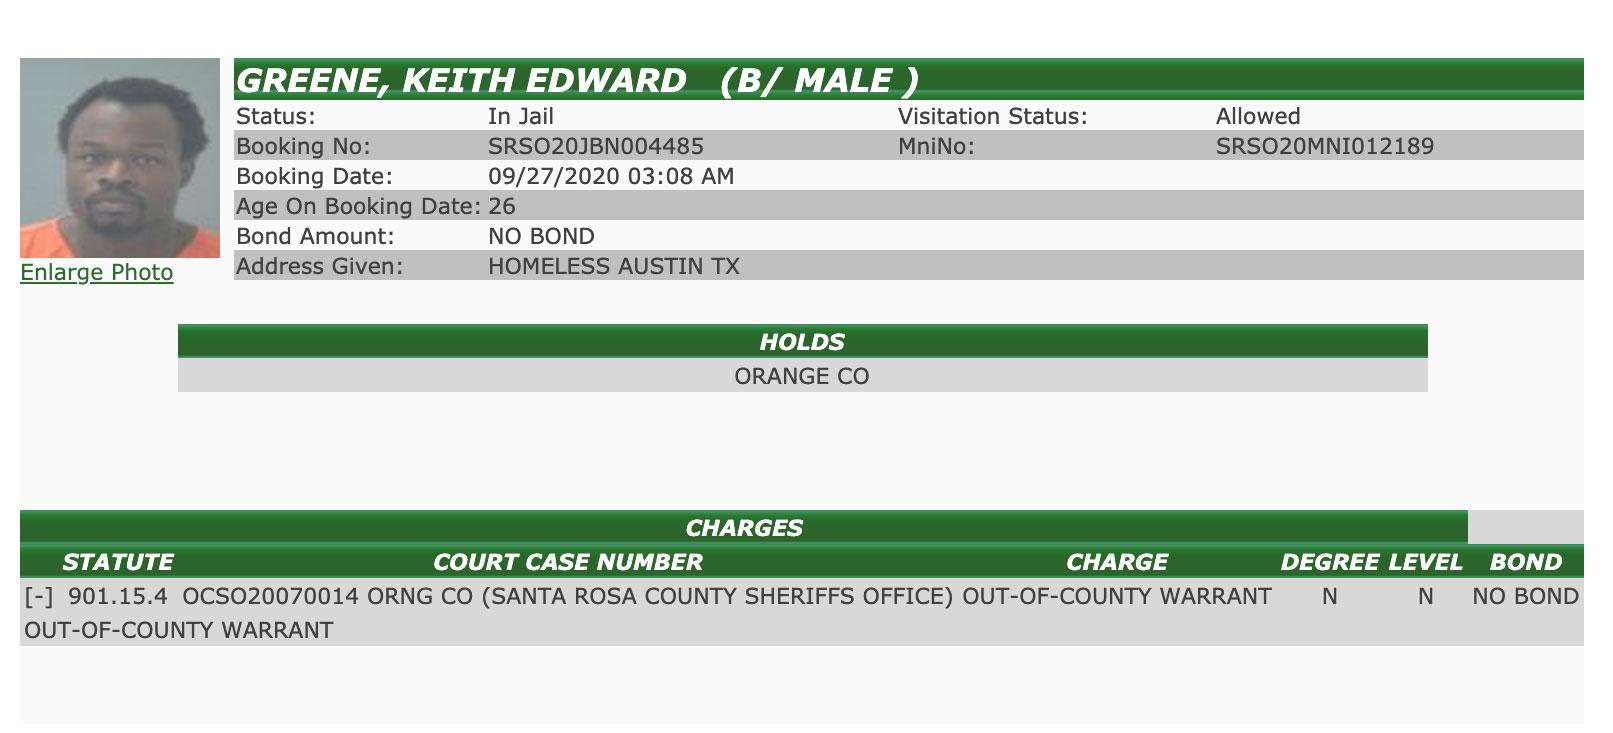 keith-edward-greene-santa-rosa-county-florida